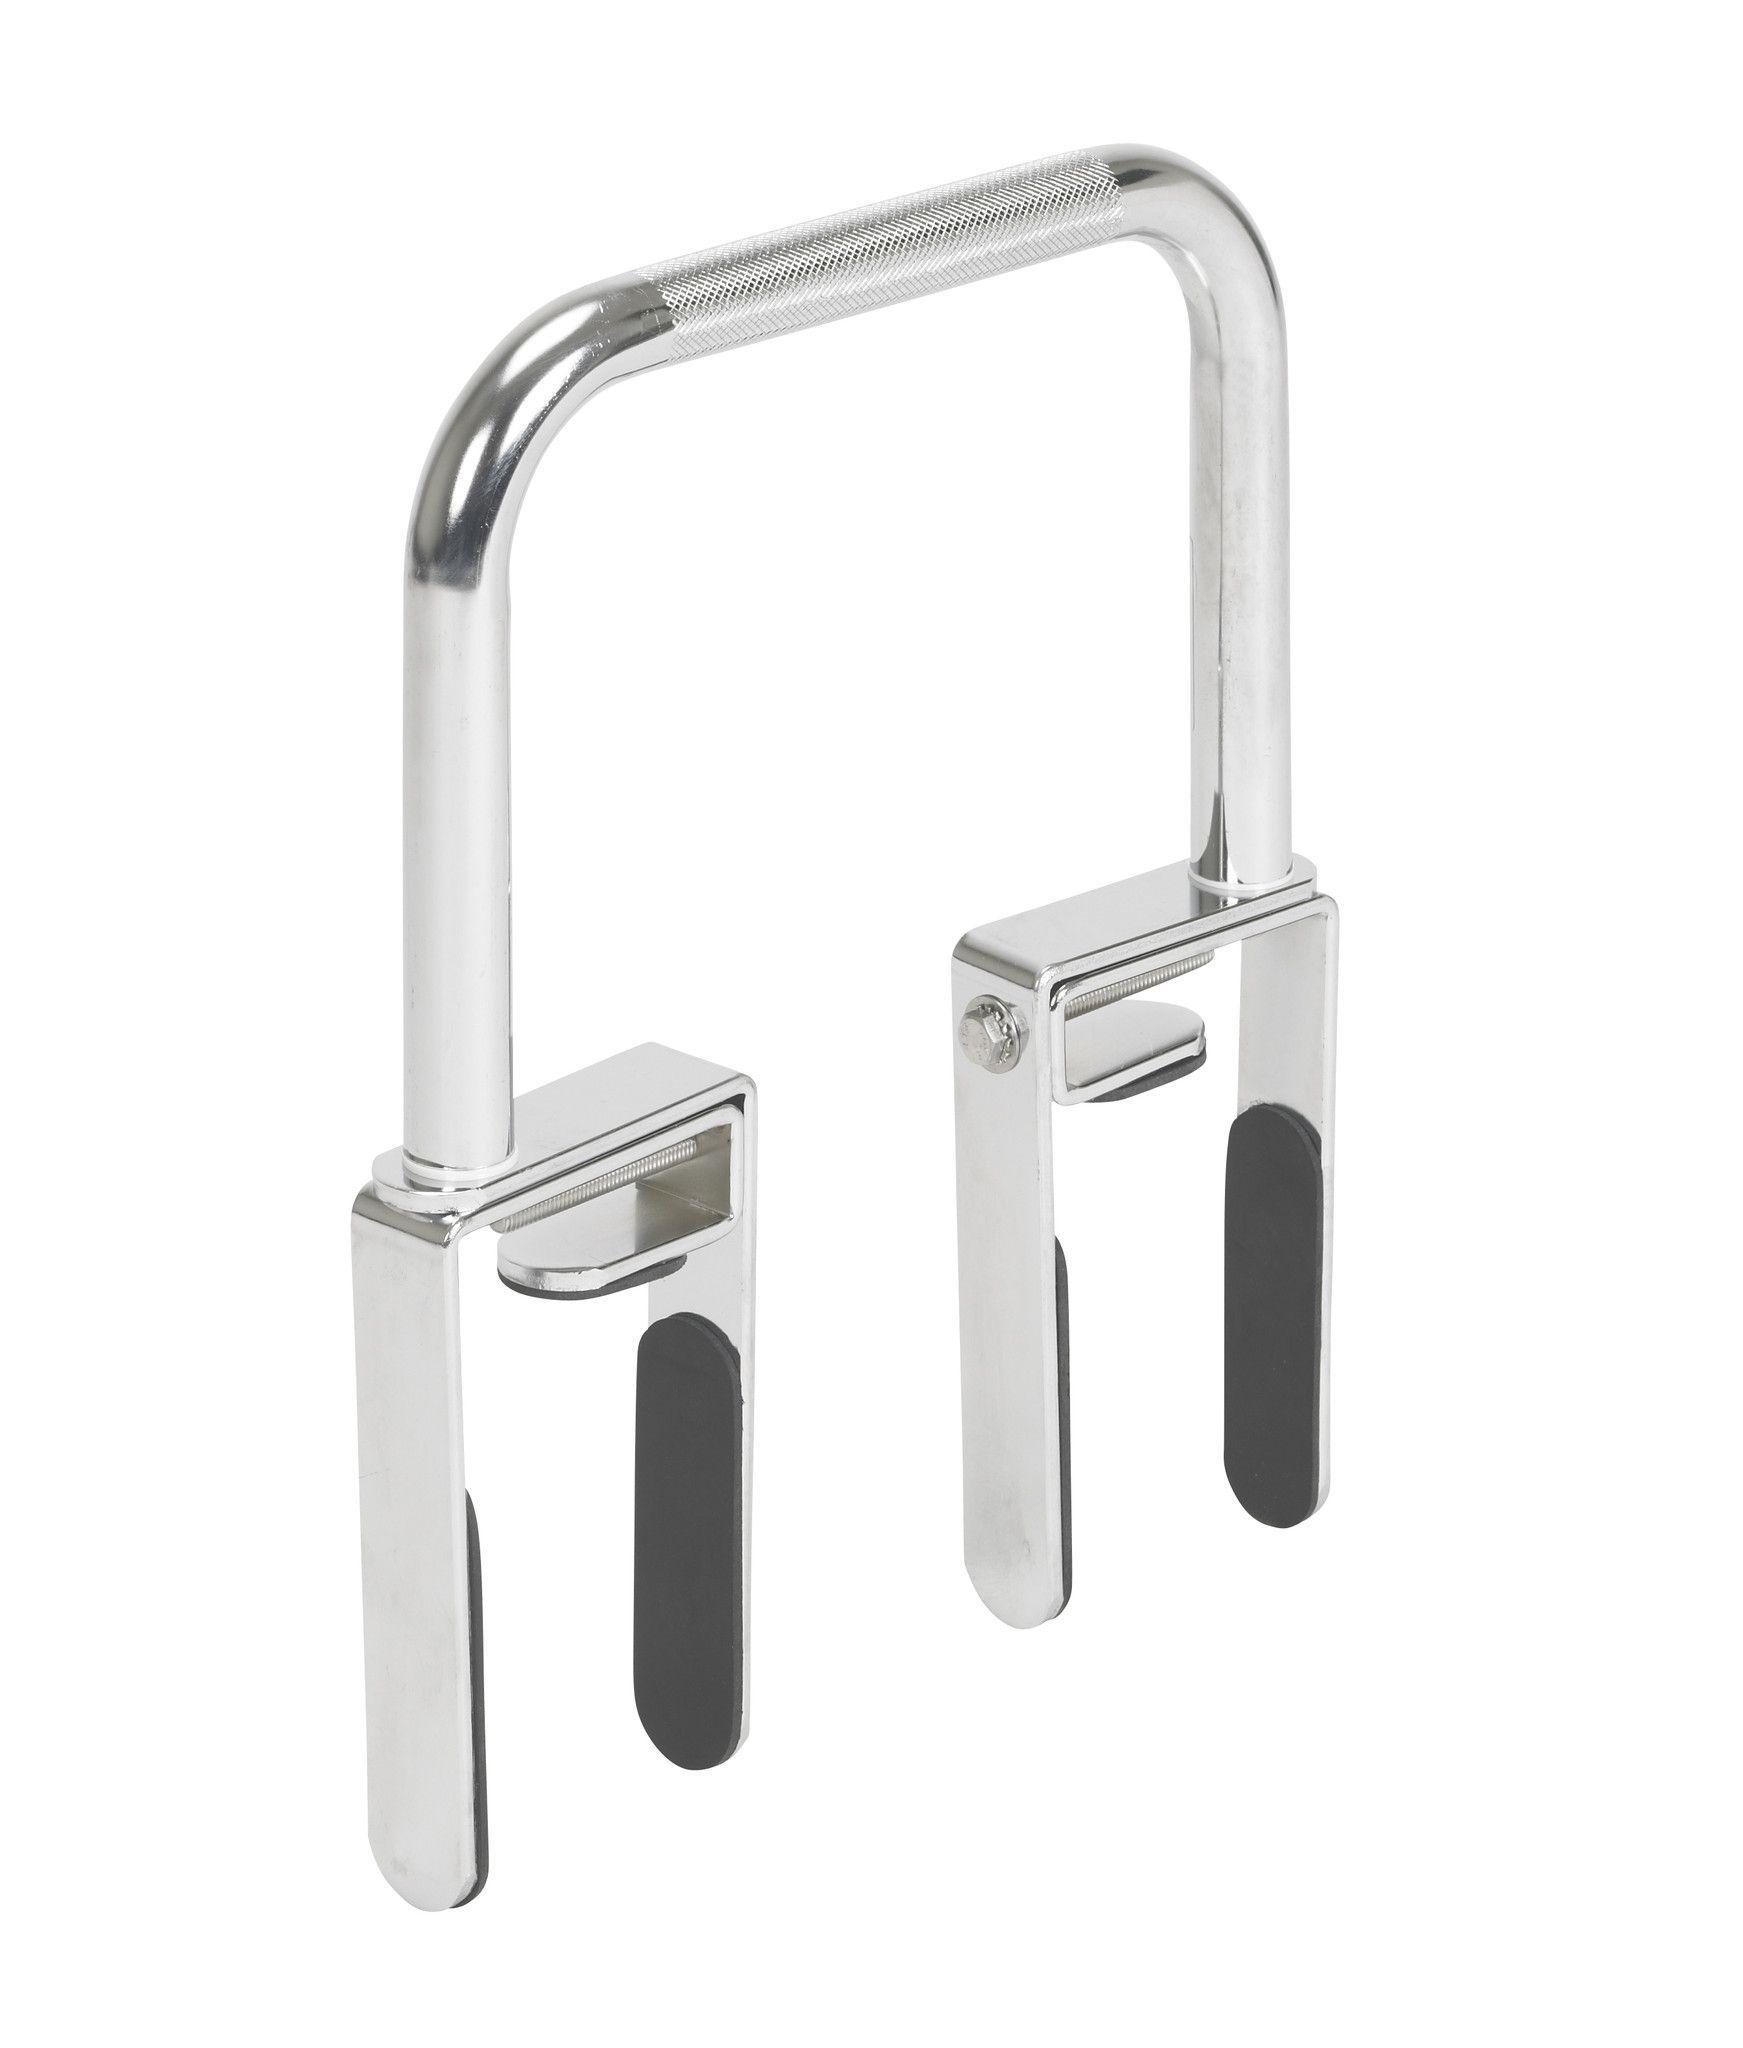 The bathtub grab bar safety rail was designed for individuals